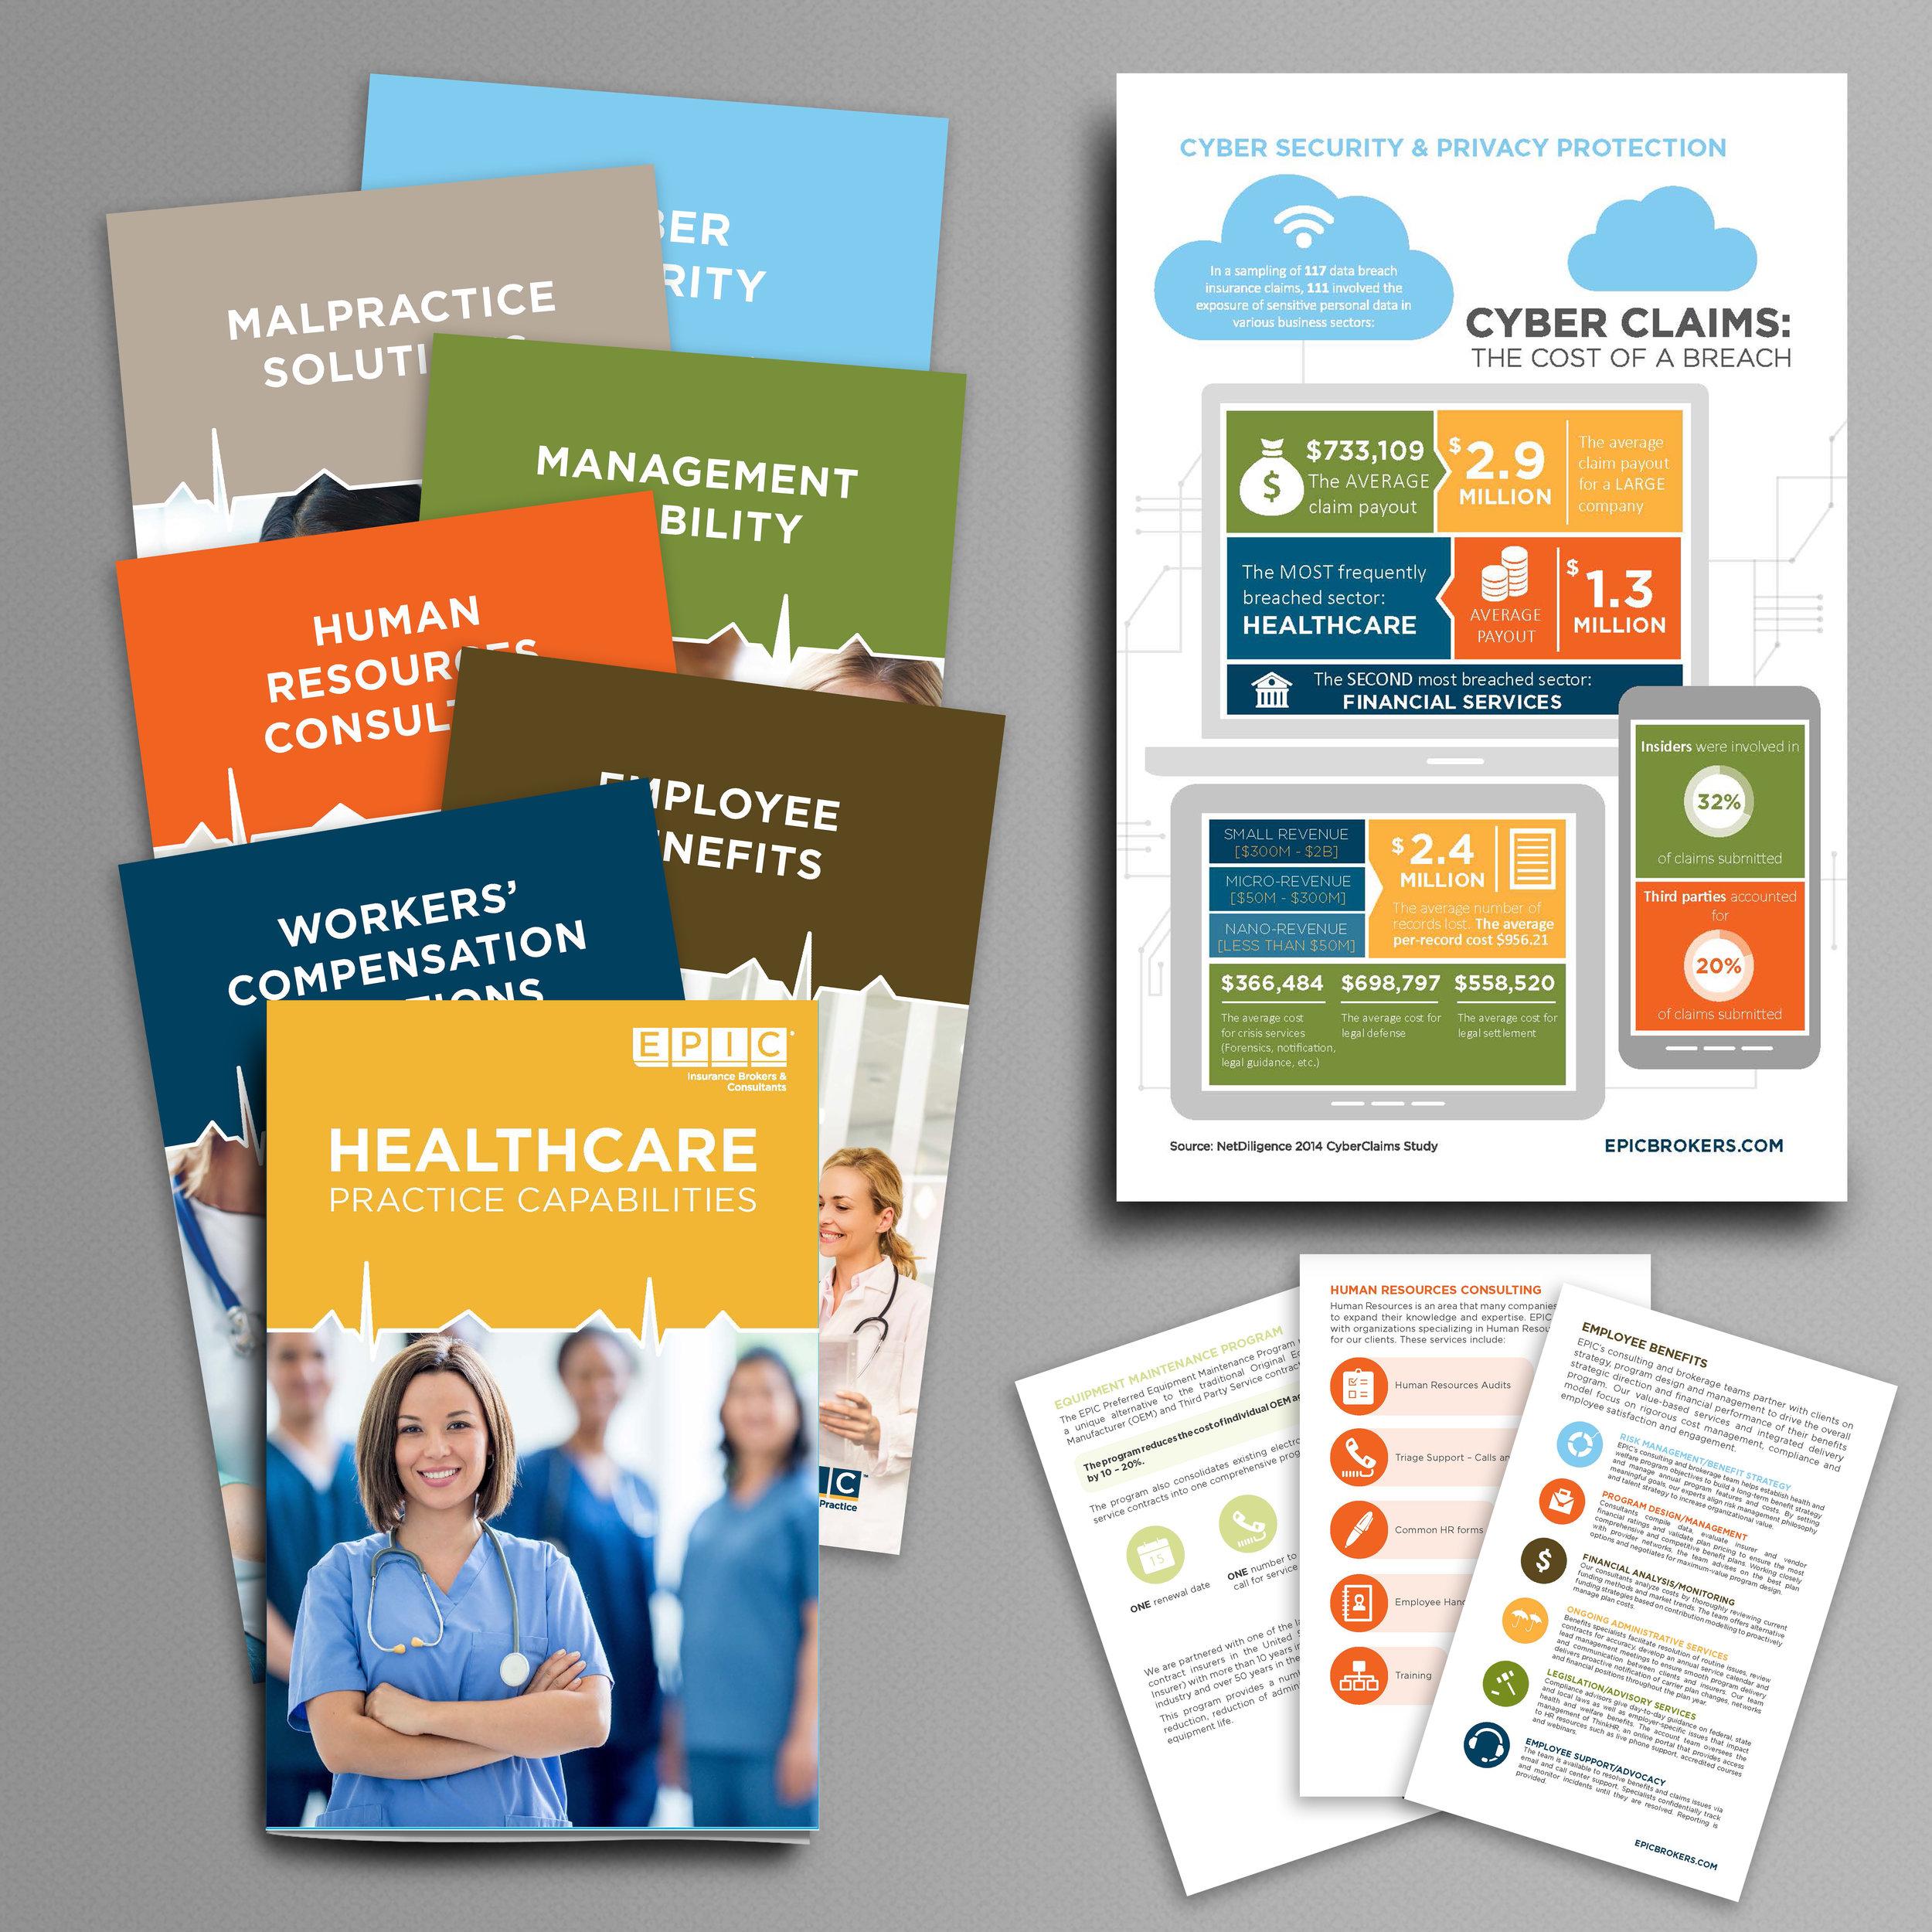 Healthcare-Comp3.jpg